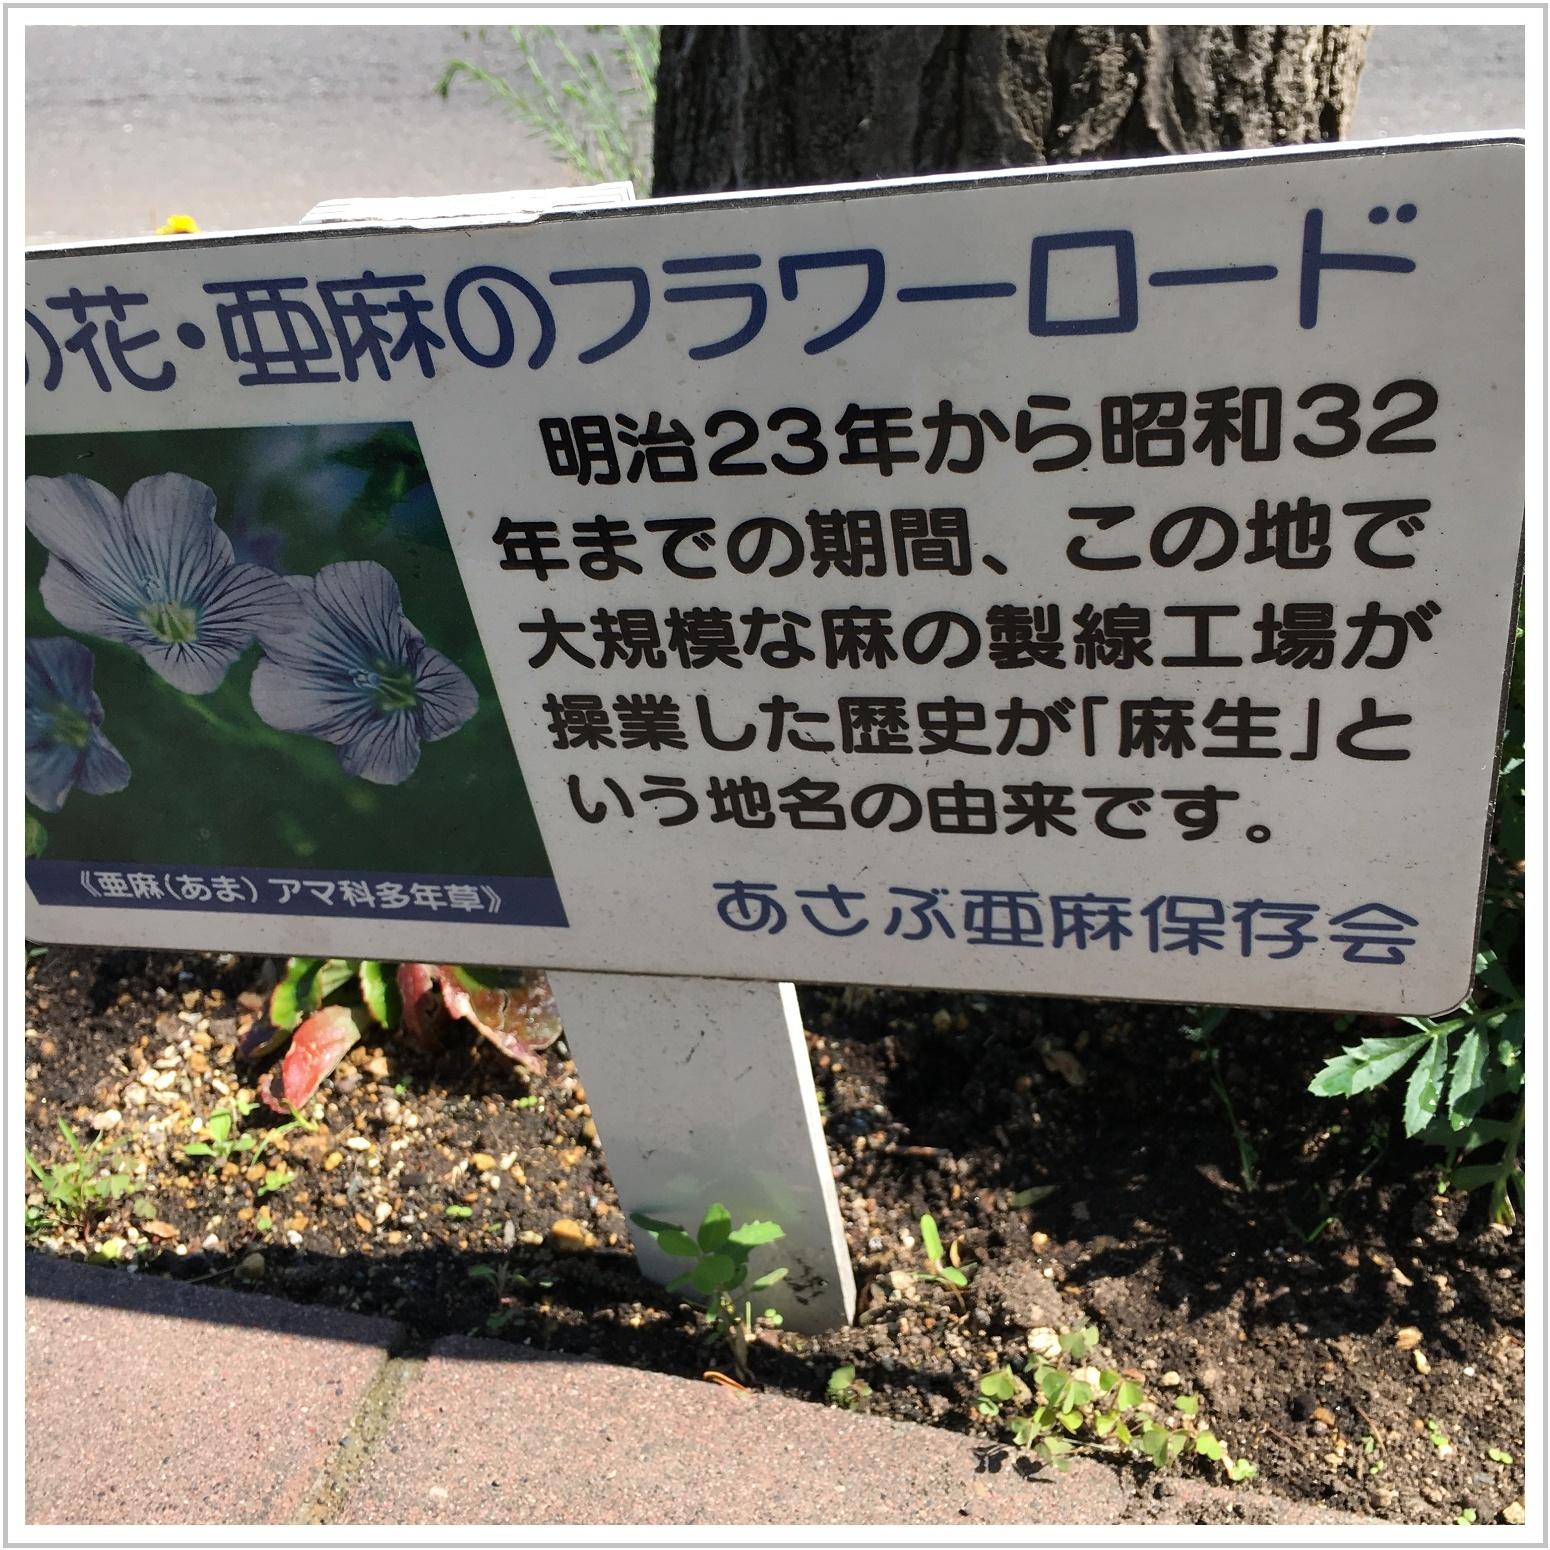 ama_1_610.jpg